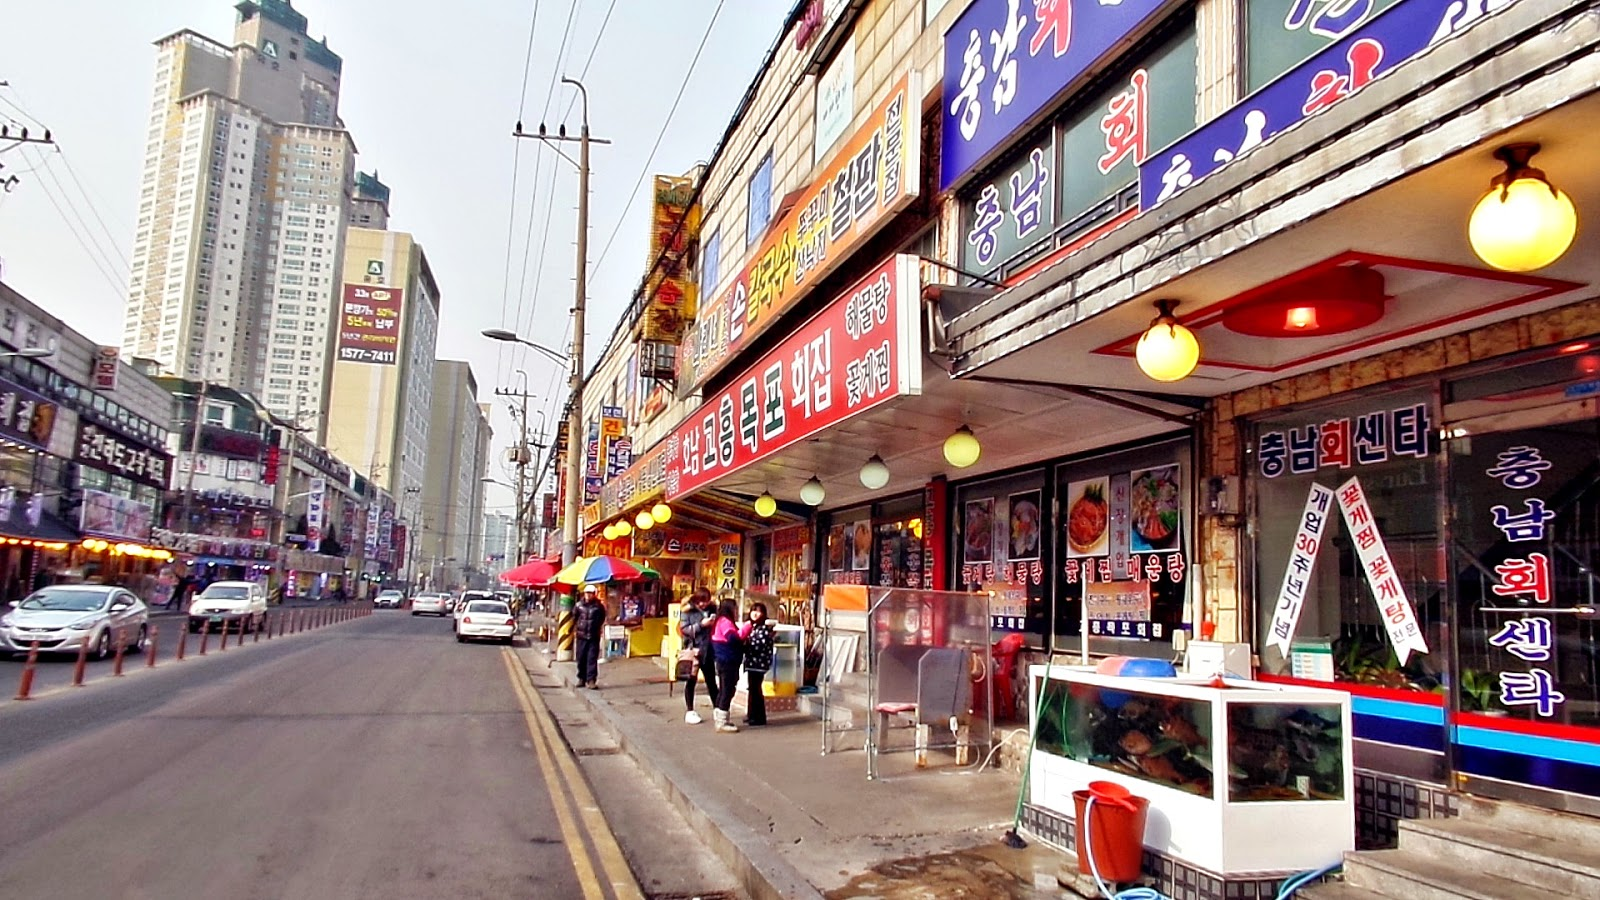 Incheon Soraepogu Fish Market 소래포구어시장   meheartsoul.blogspot.com